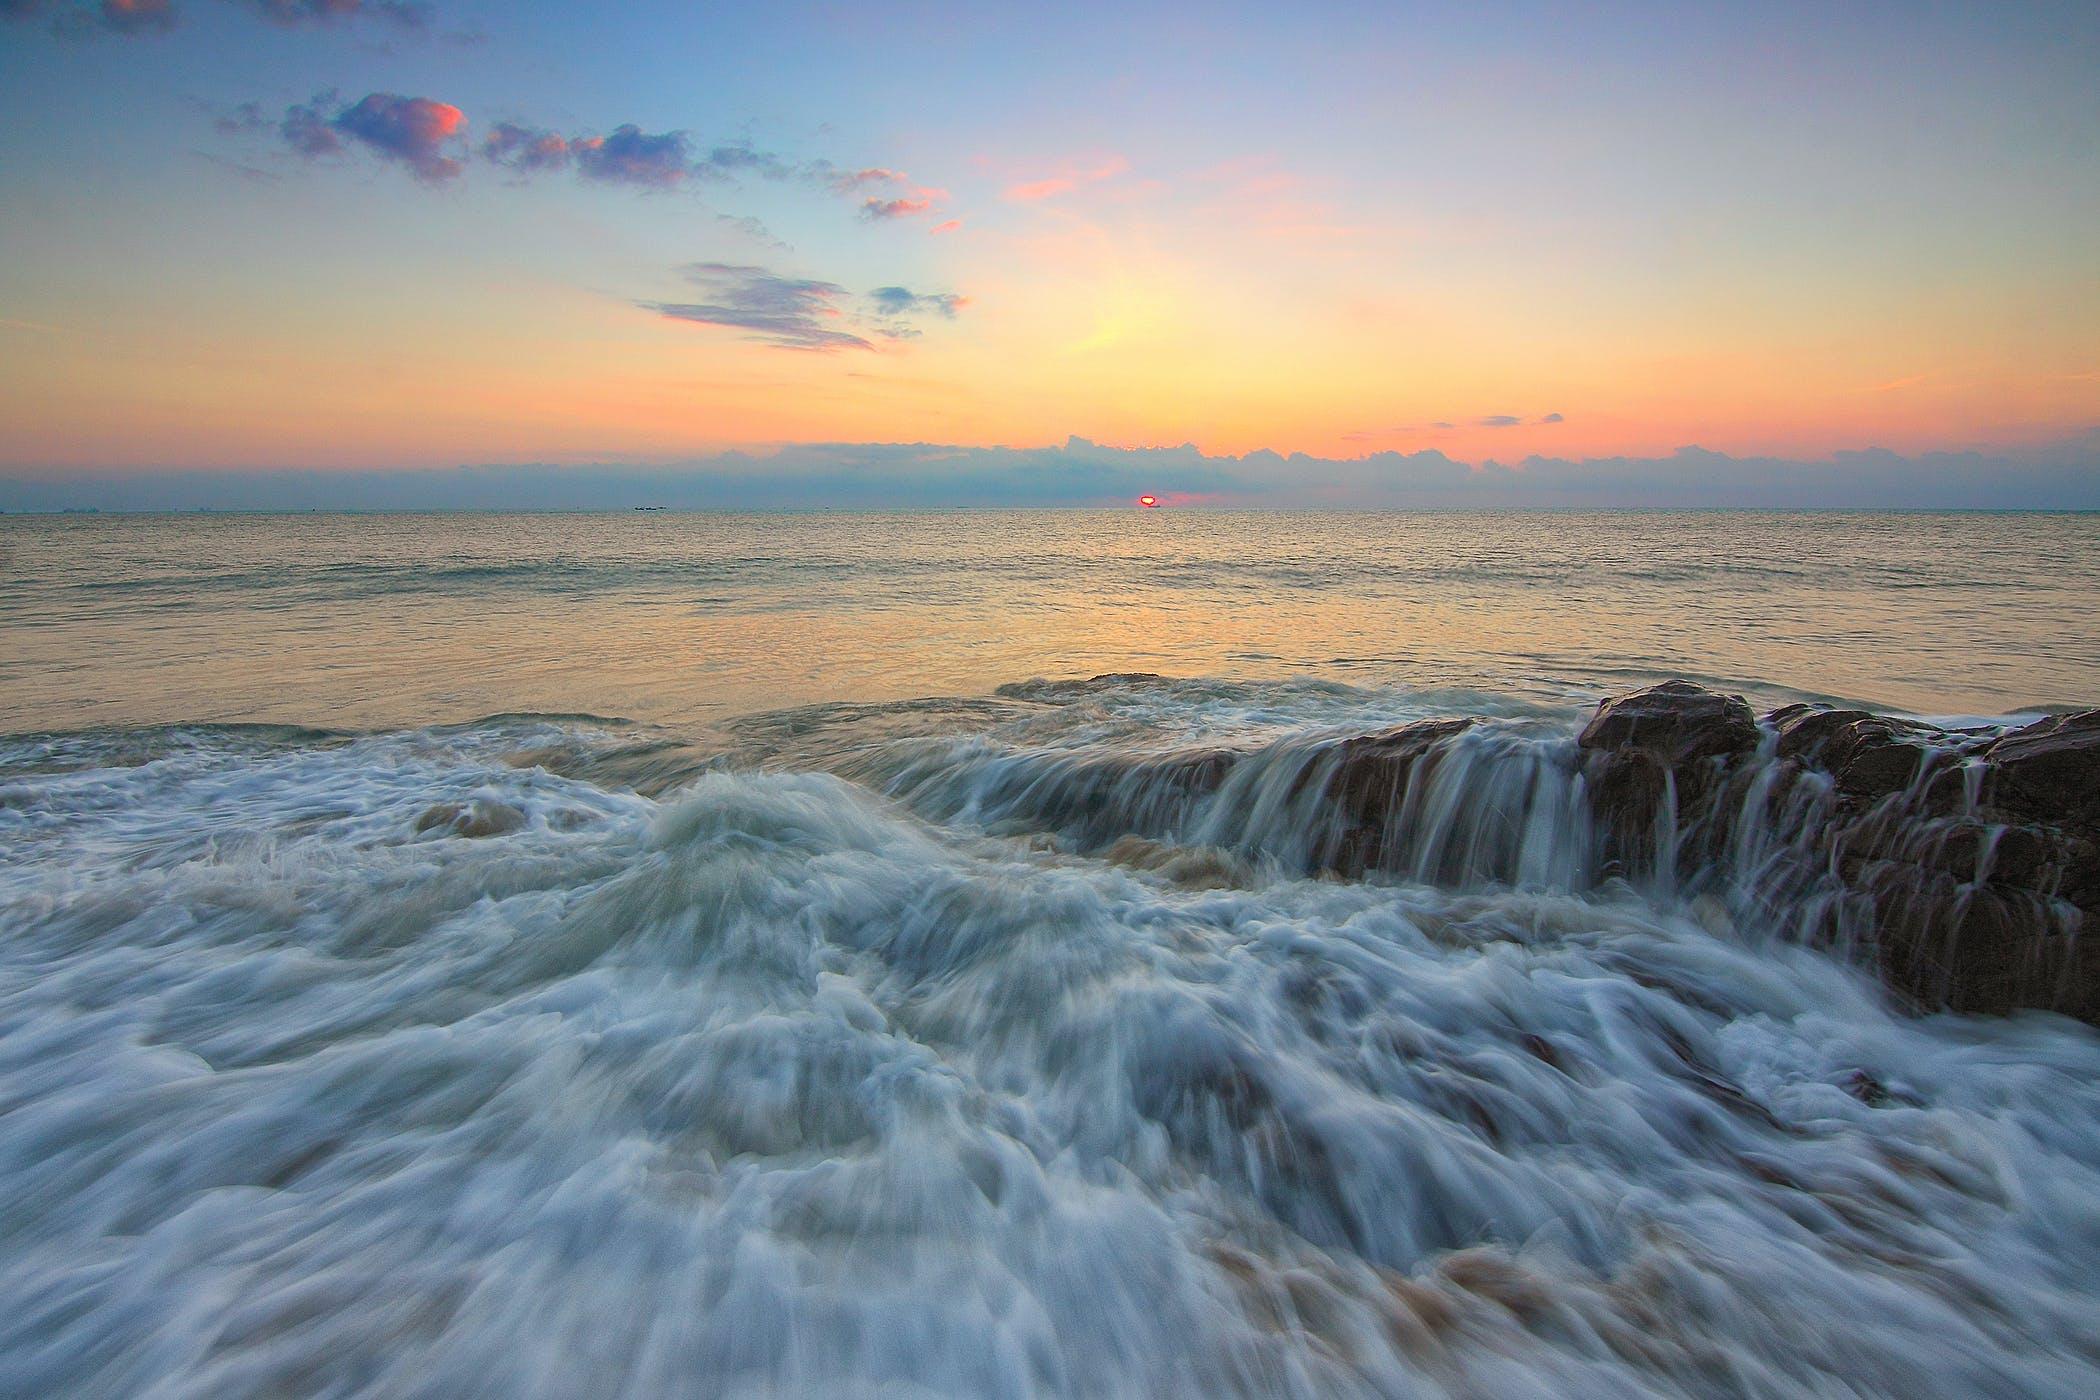 Seawaves during Golden Hour